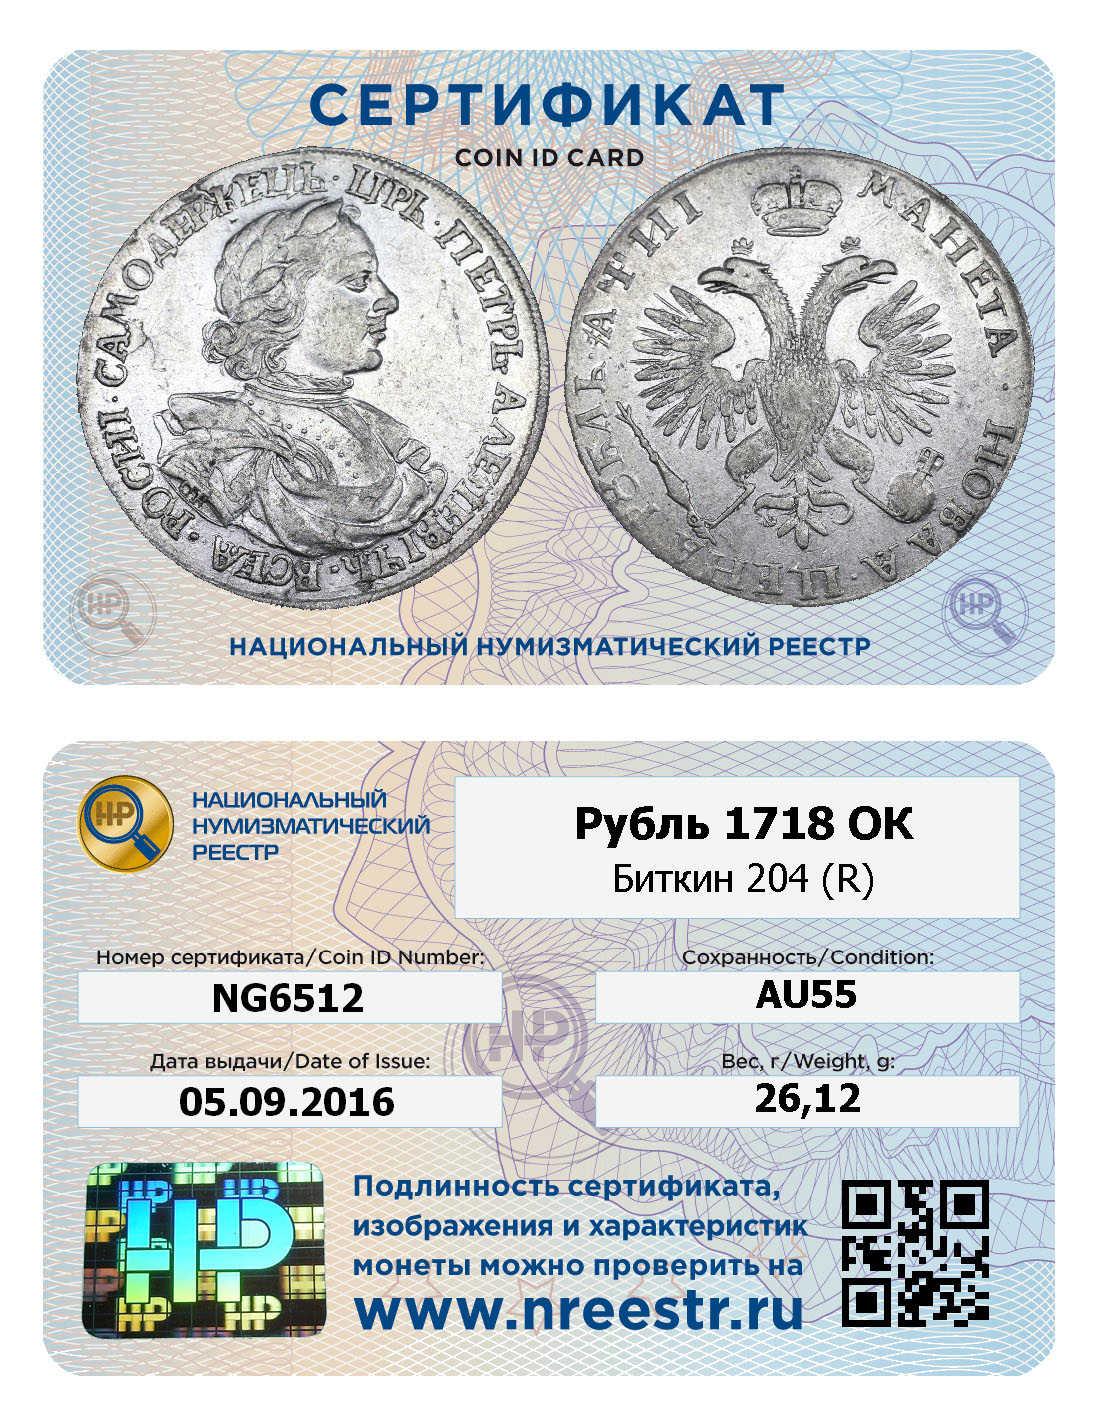 Сертификат на инвестиционную монету